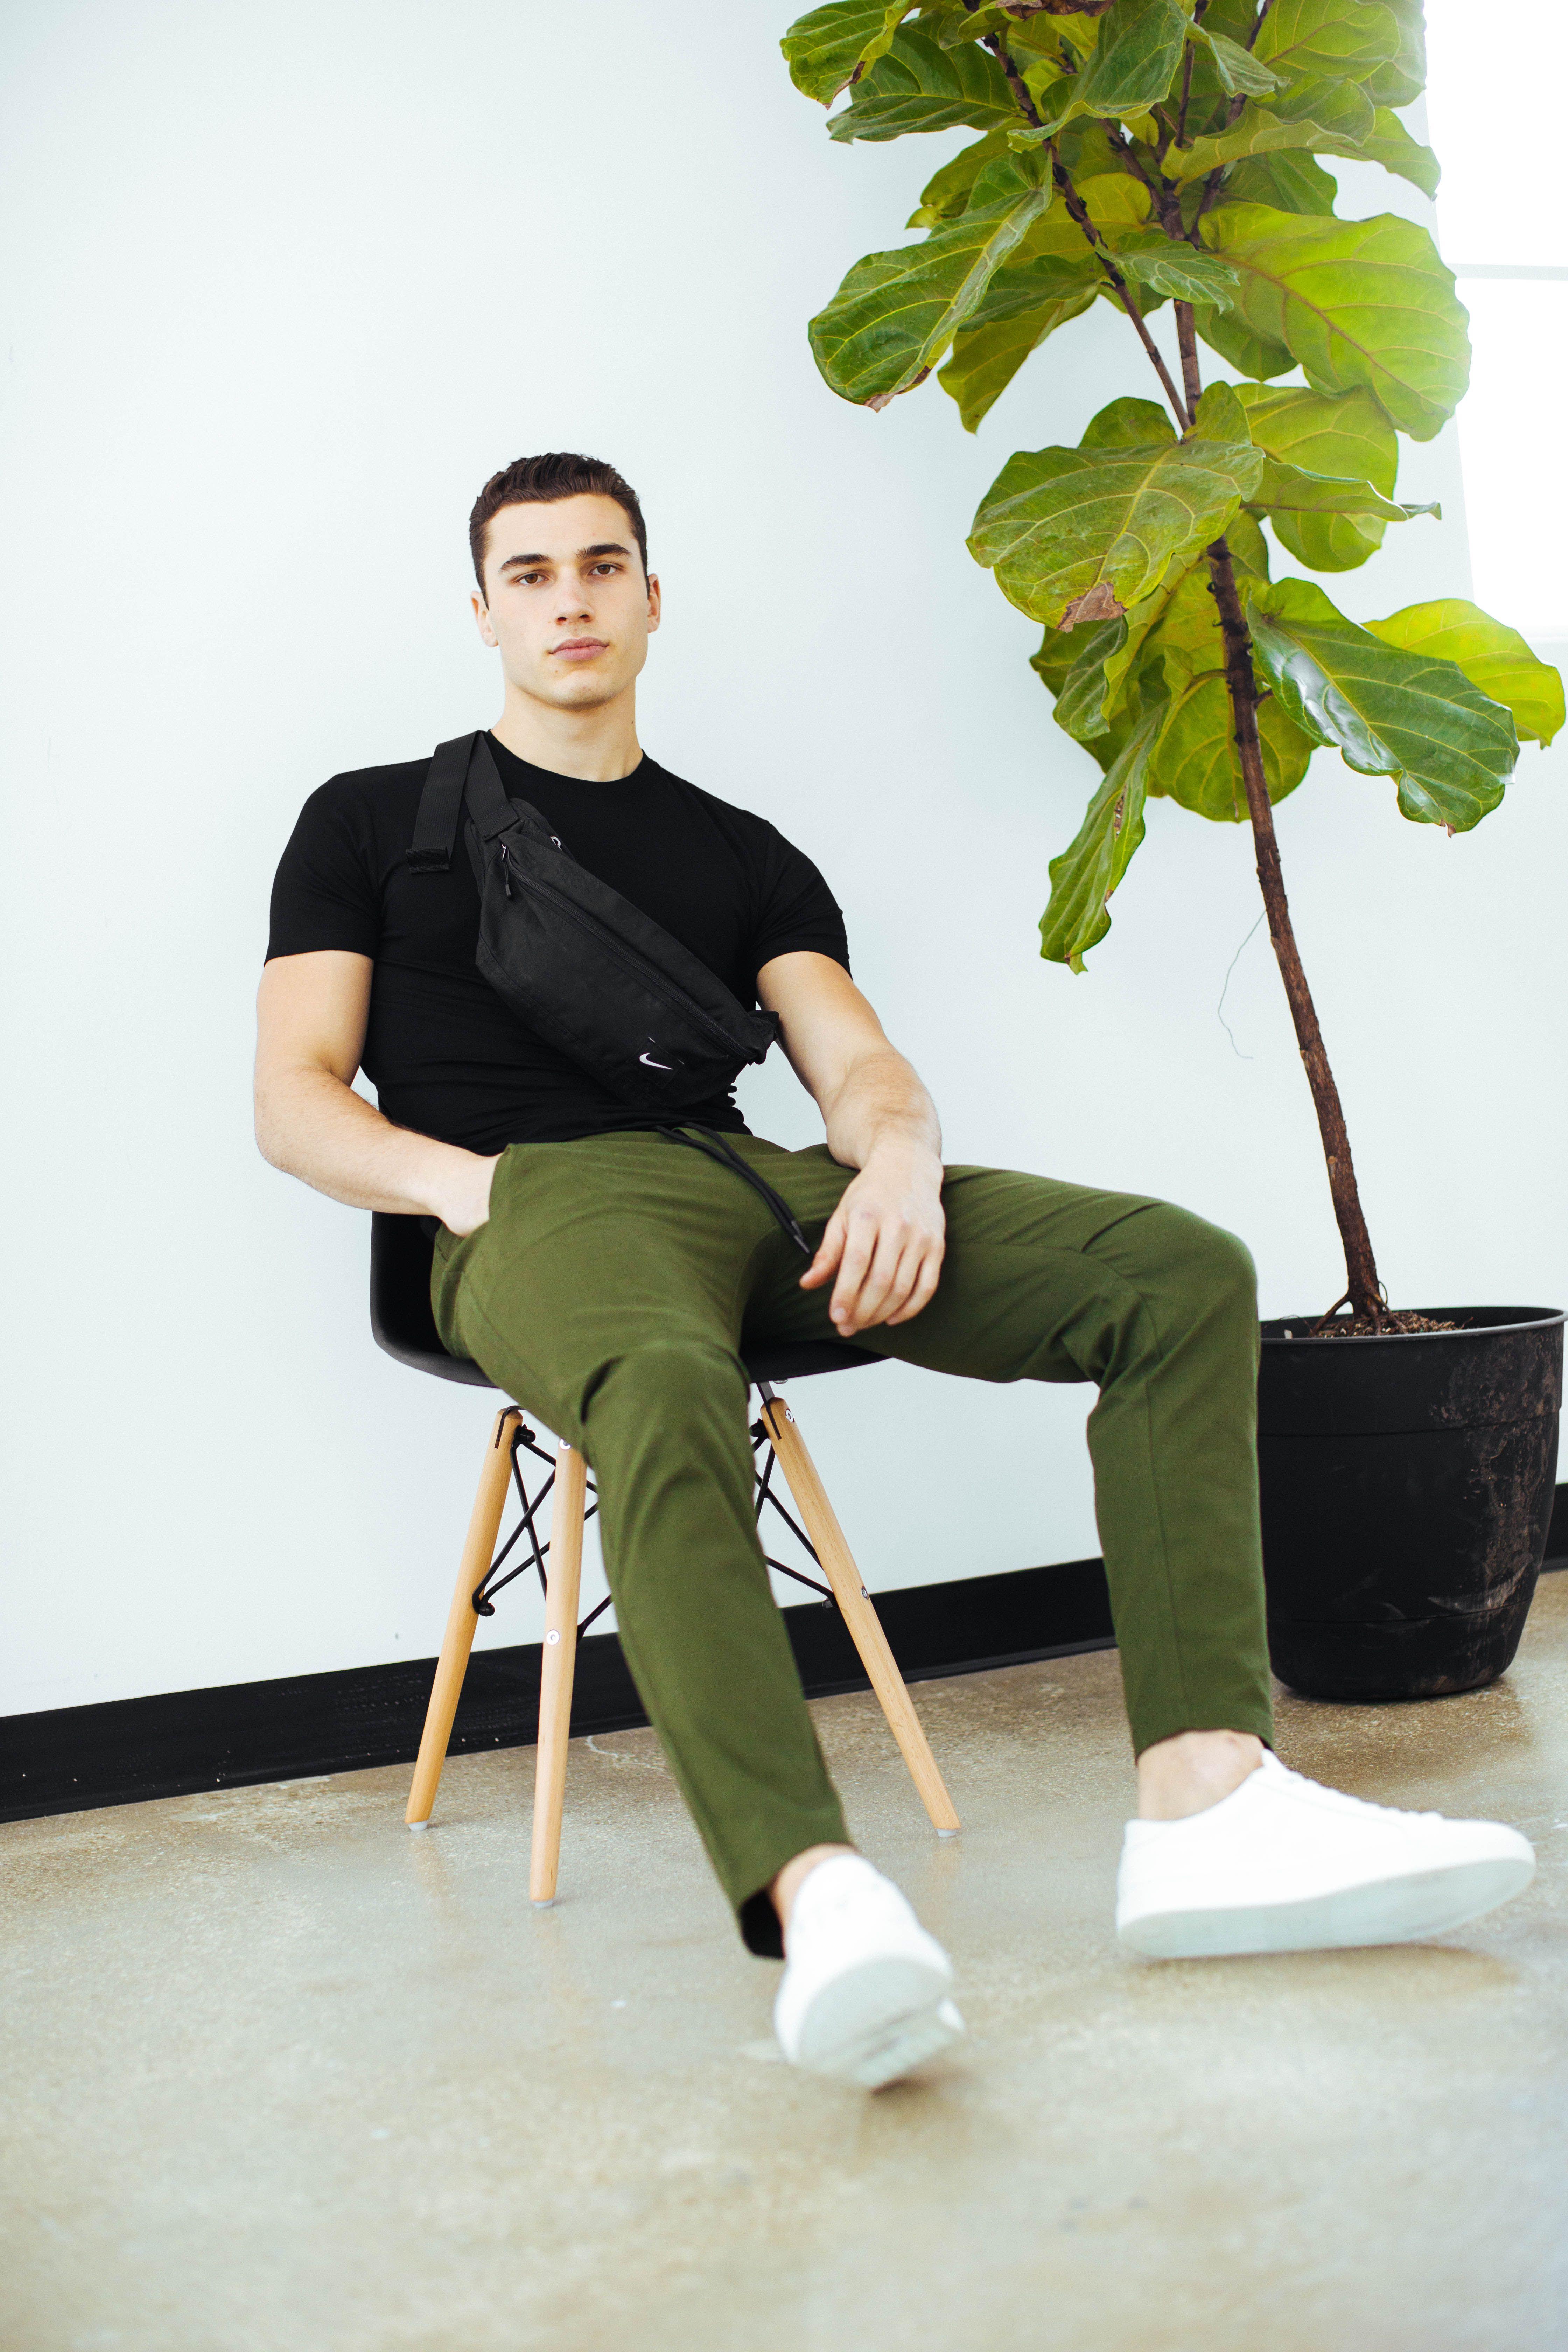 Esntls Men Photoshoot Khaki Pants Fashion [ 6720 x 4480 Pixel ]